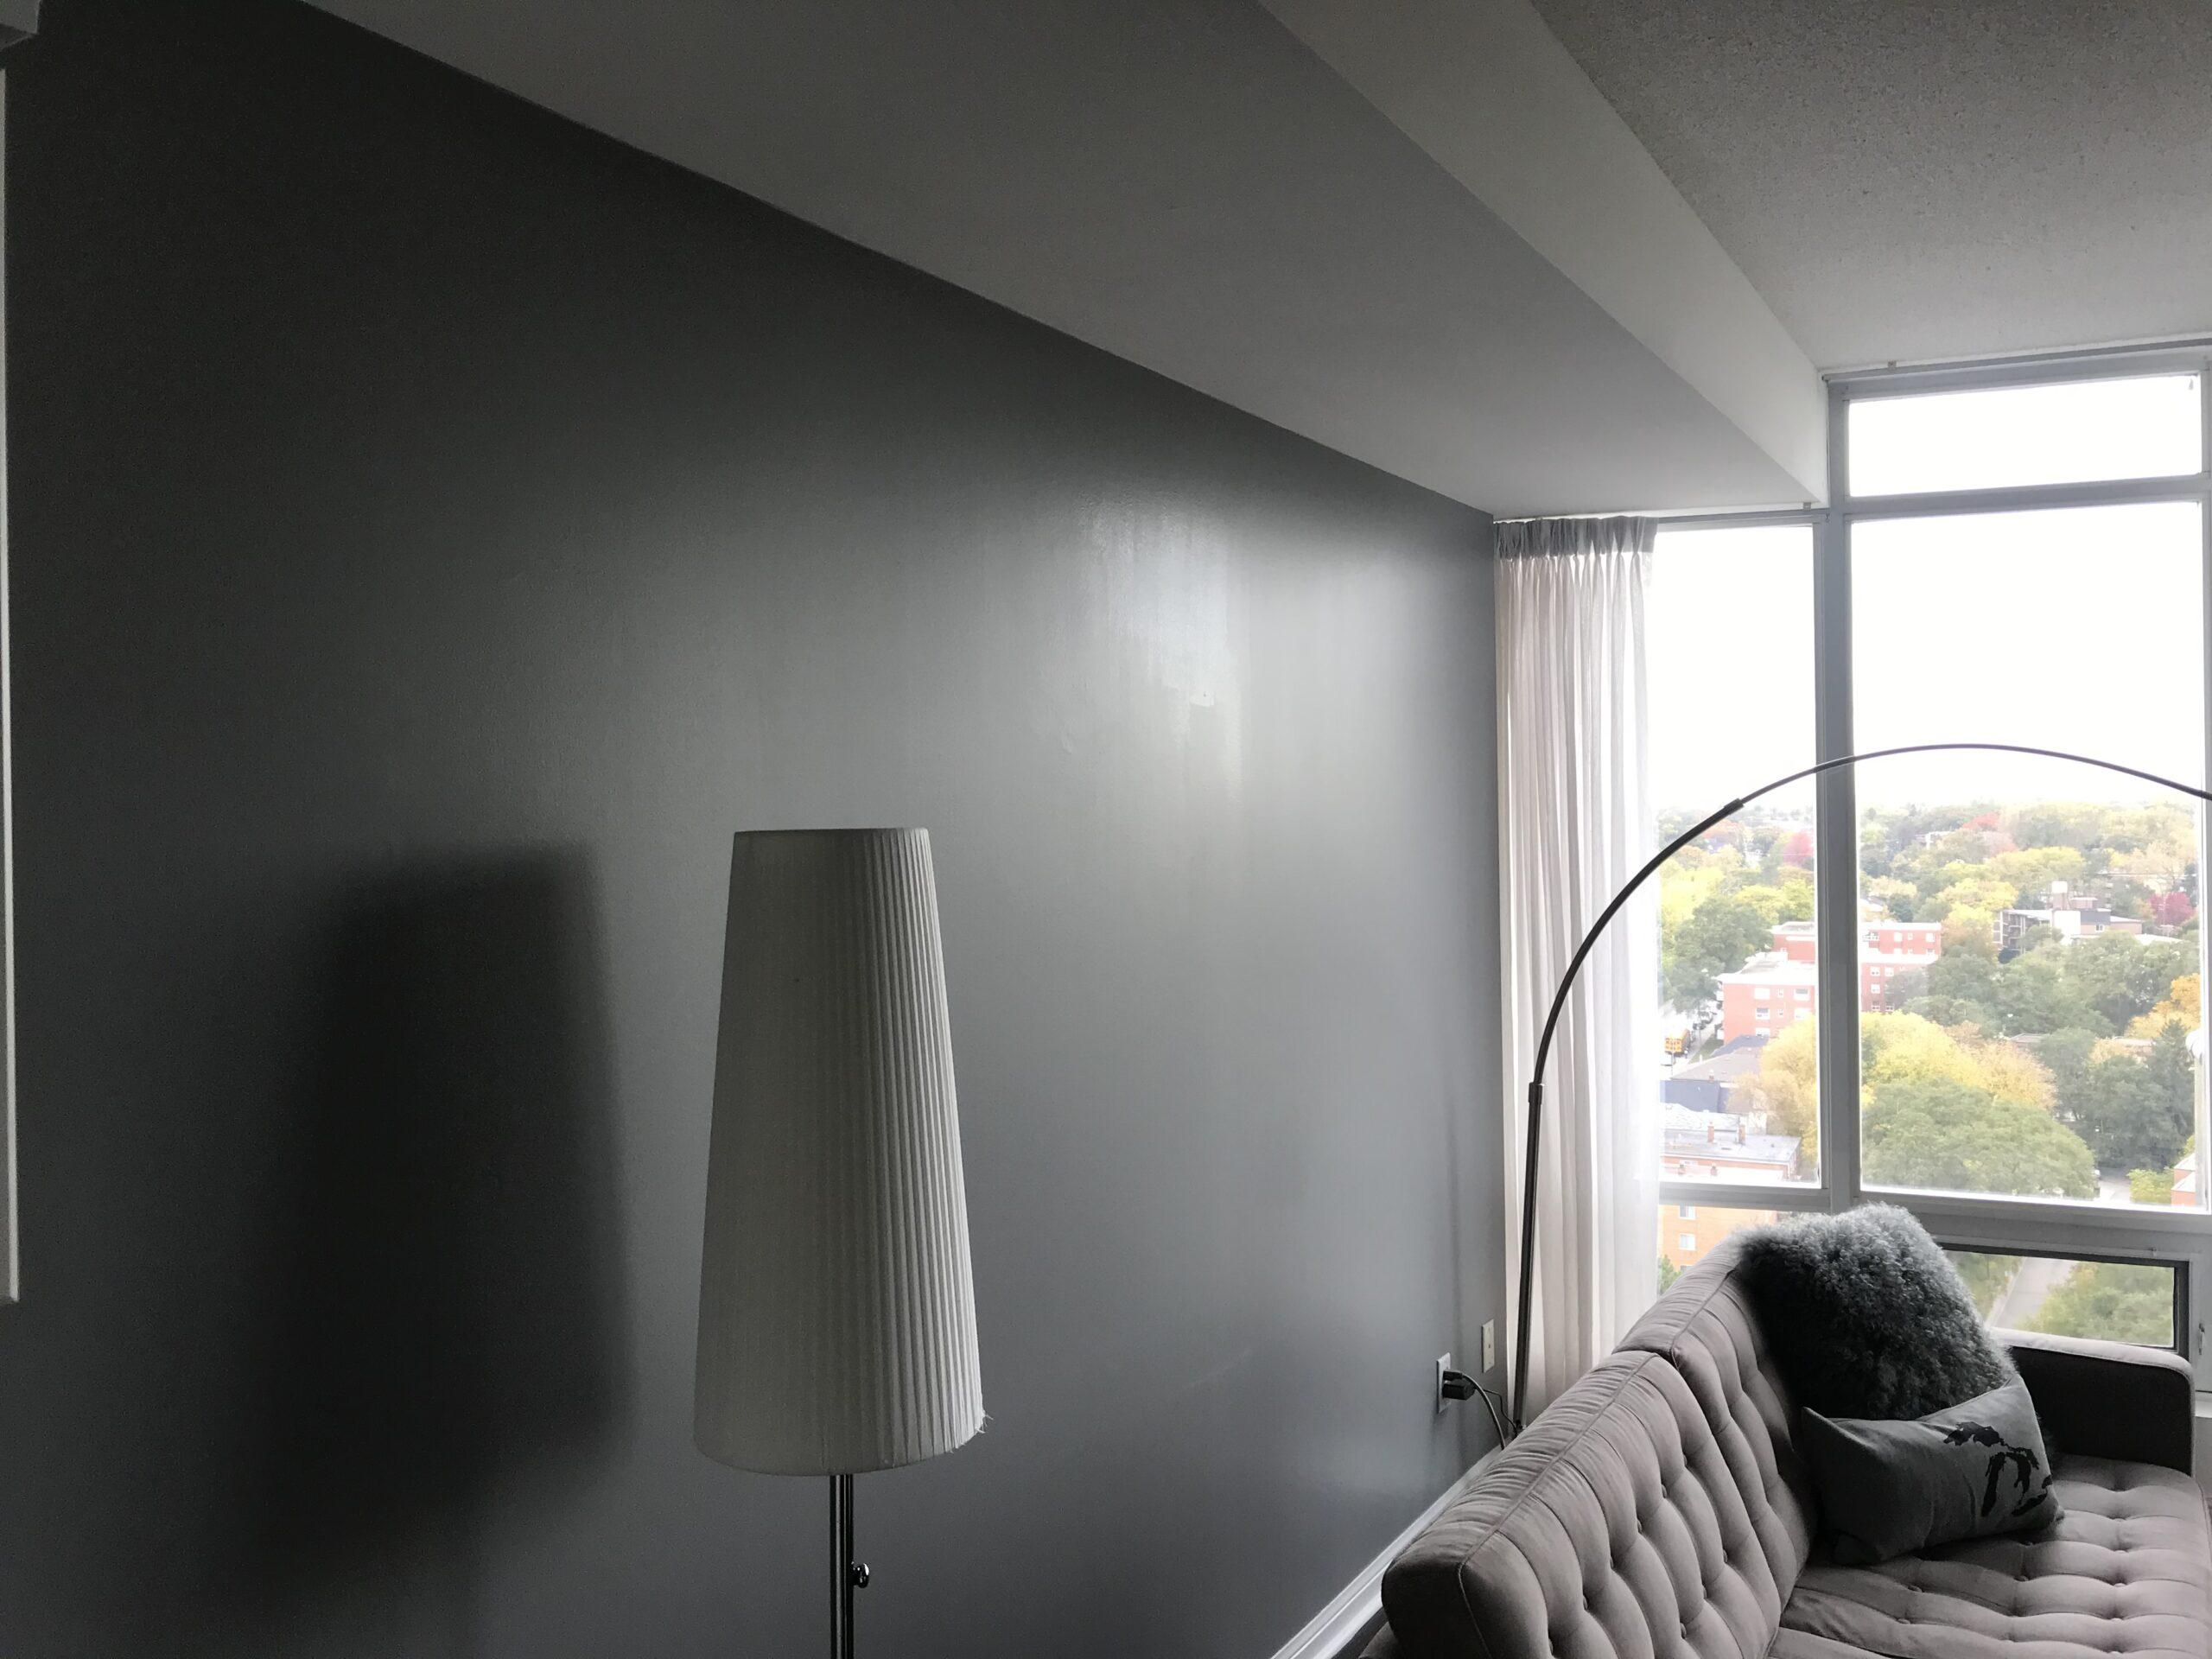 Condo Painting